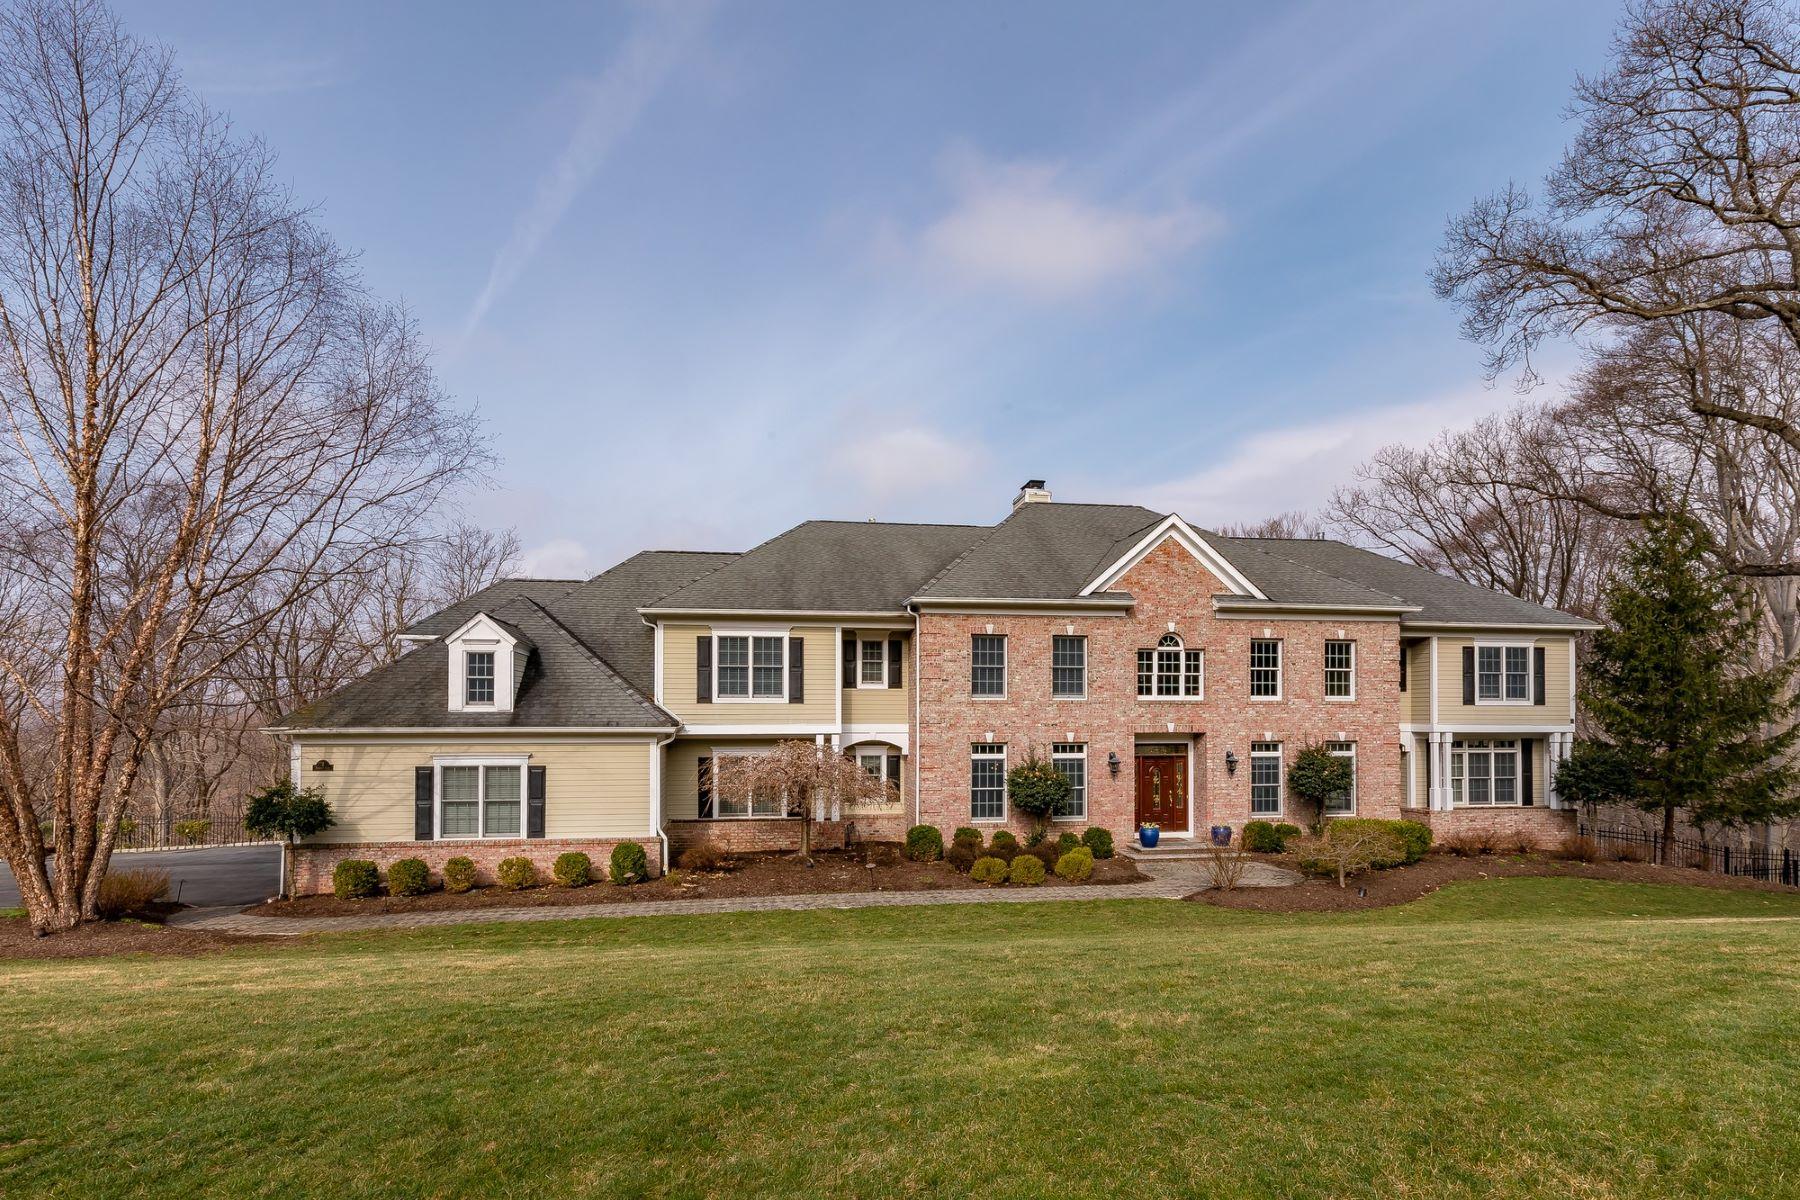 Moradia para Venda às Extraordinary Colonial Home 7 Pioneers Lane, Morris Township, Nova Jersey 07960 Estados Unidos